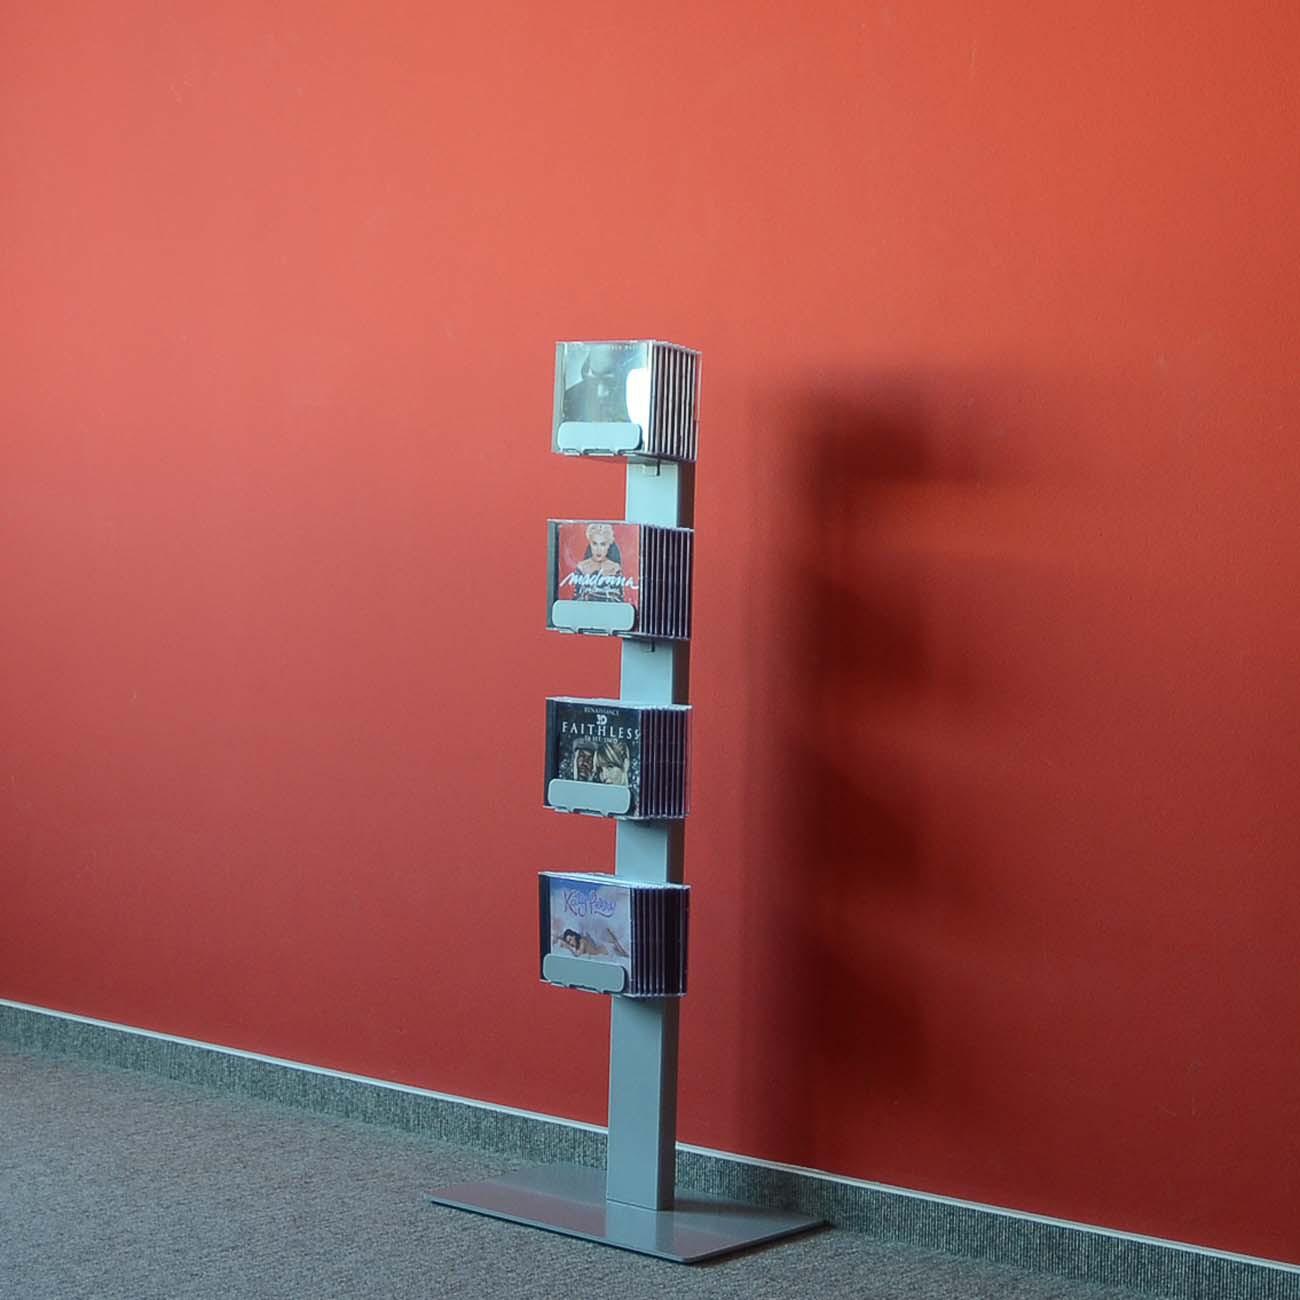 radius cd baum regal silber stand 2 klein 737 c m bel regale standregale. Black Bedroom Furniture Sets. Home Design Ideas